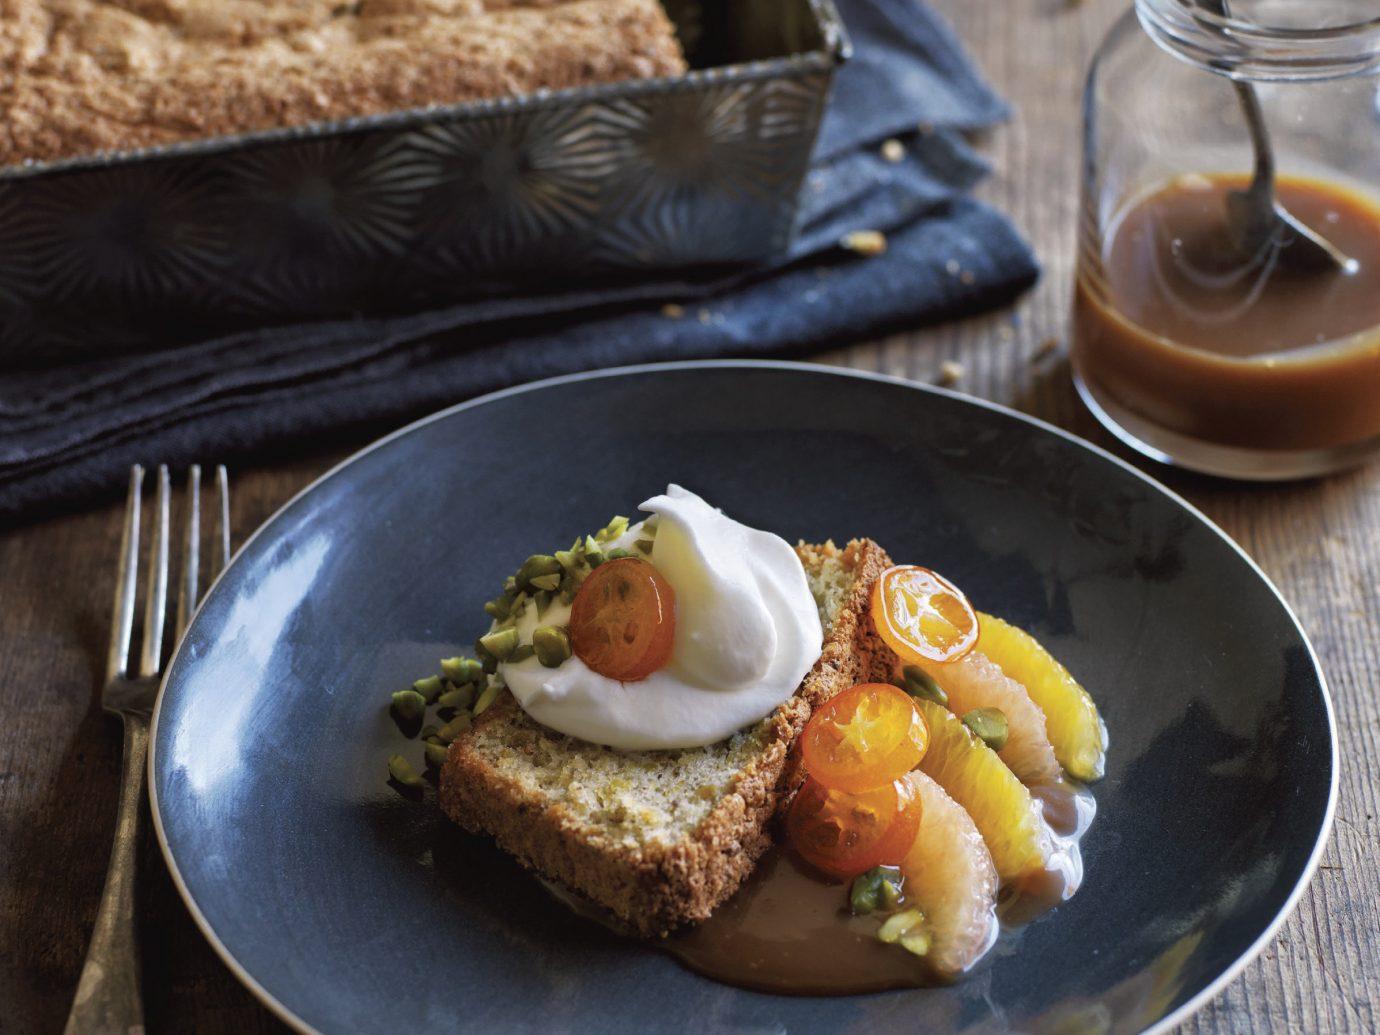 Food + Drink plate table food dish meal breakfast produce plant land plant vegetable flowering plant fruit